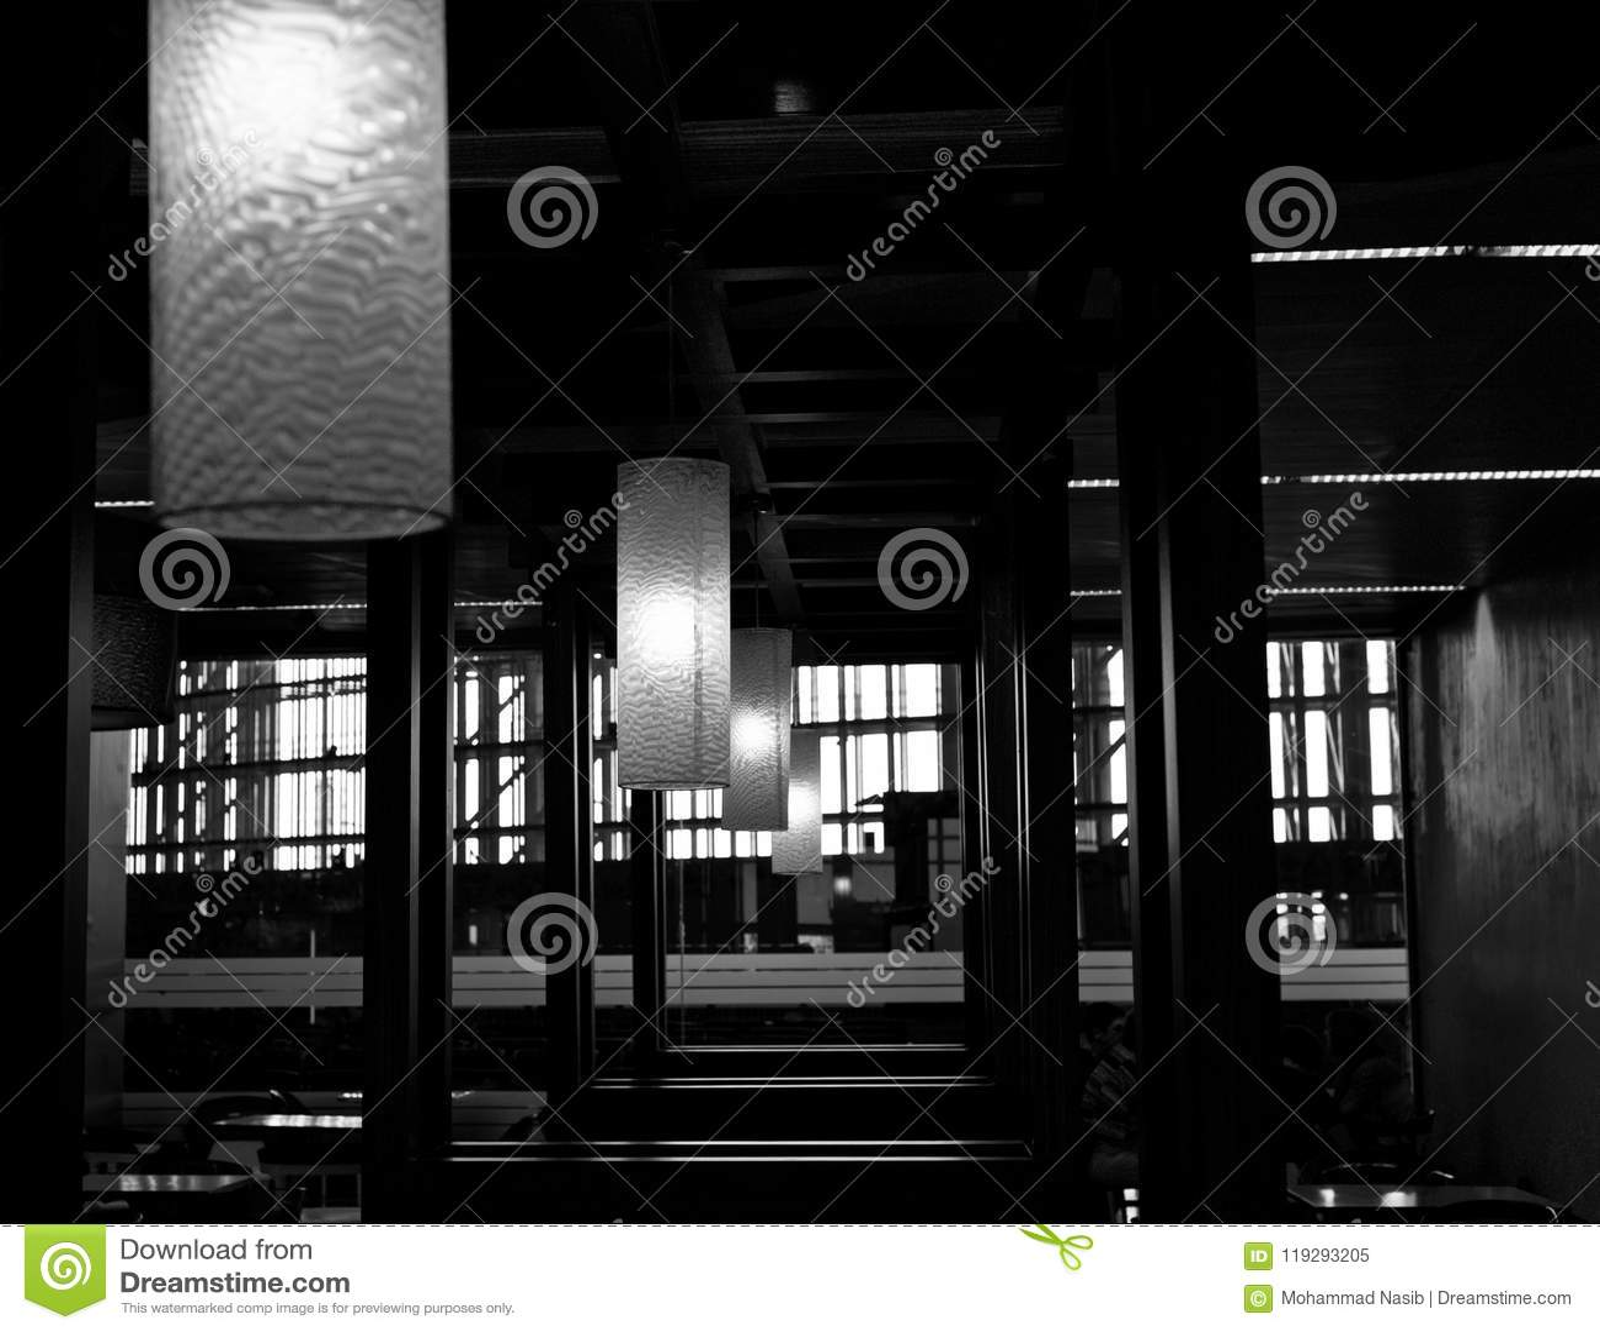 Download Beautiful Interior Decoration Lights Unique Photo Stock Image - Image of backdrop, interior: 119293205